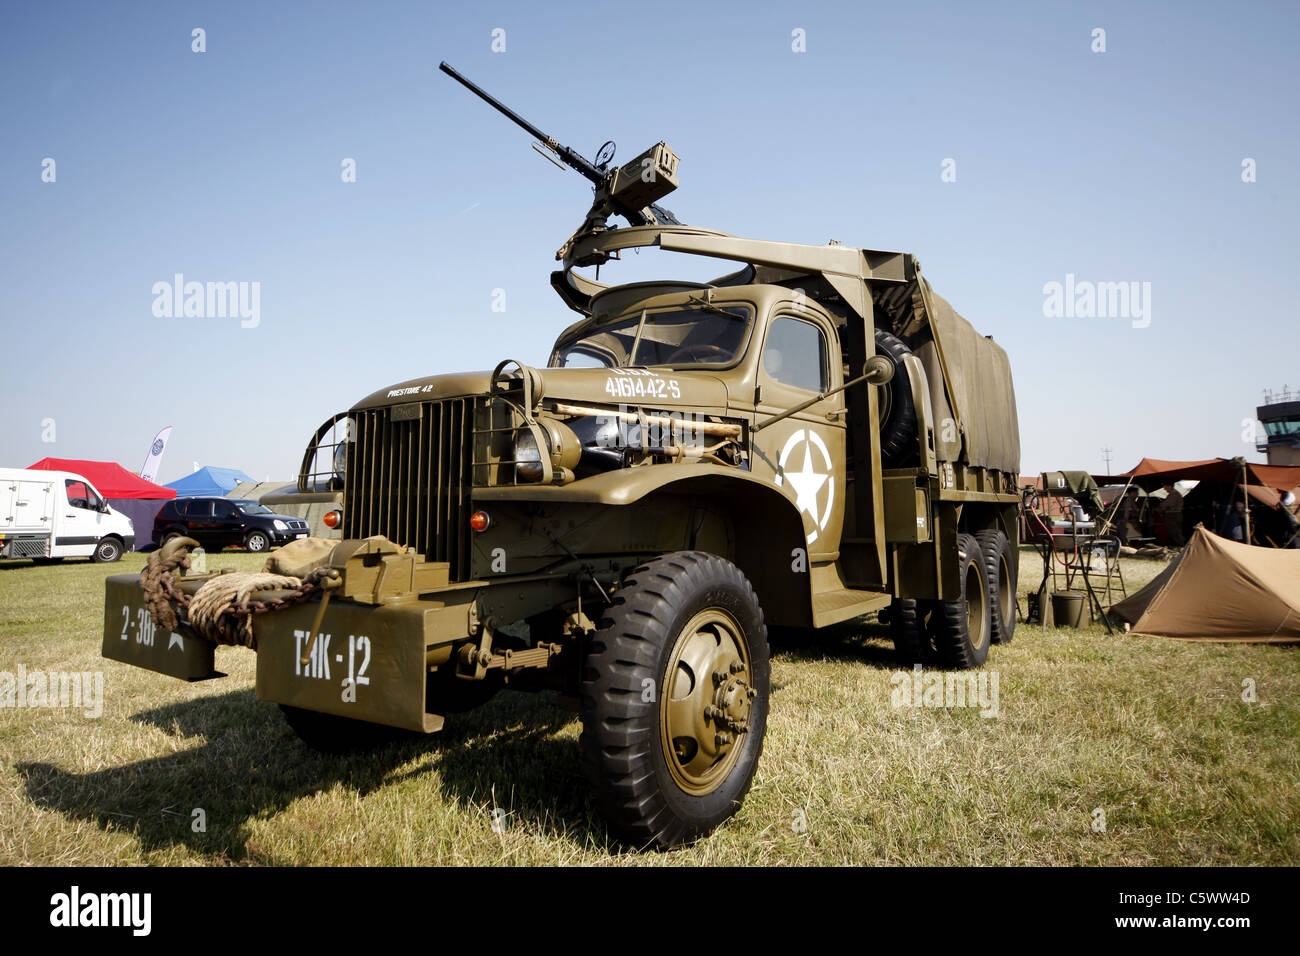 GMC PRESTONE 42 US ARMY TRUCK WORLD WAR II HISTORIC DISPLAY 03 July 2011 - Stock Image